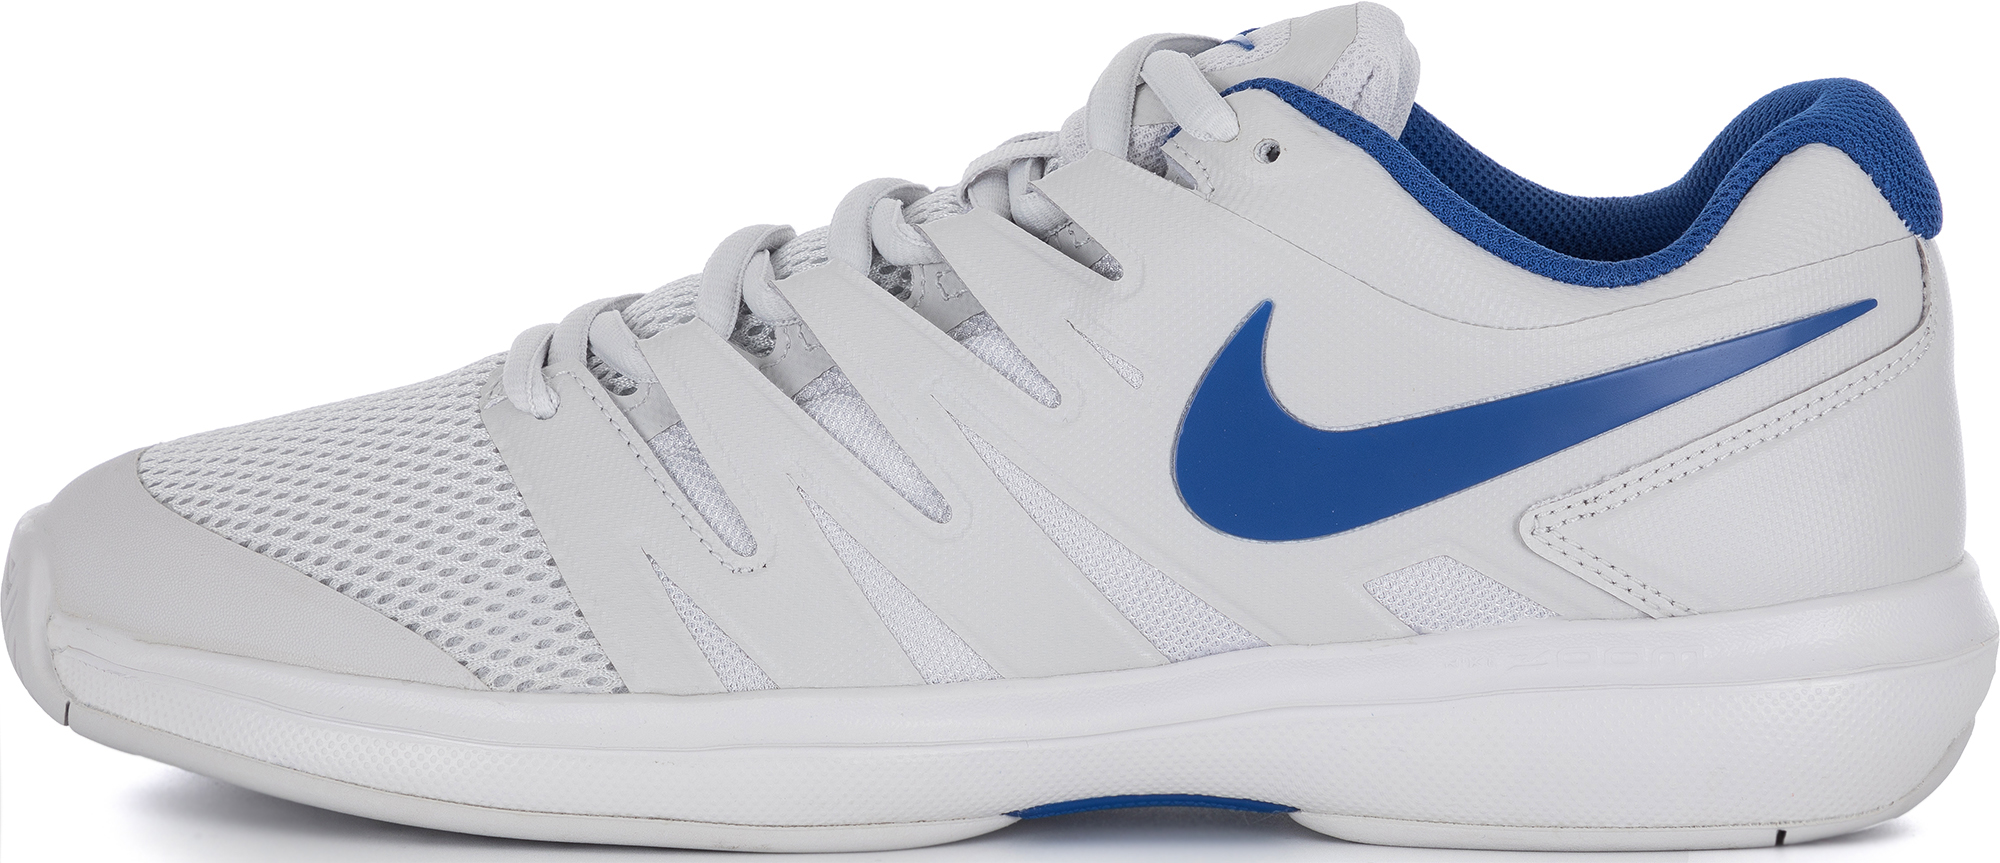 Nike Кроссовки мужские Air Zoom Prestige Hc, размер 46,5